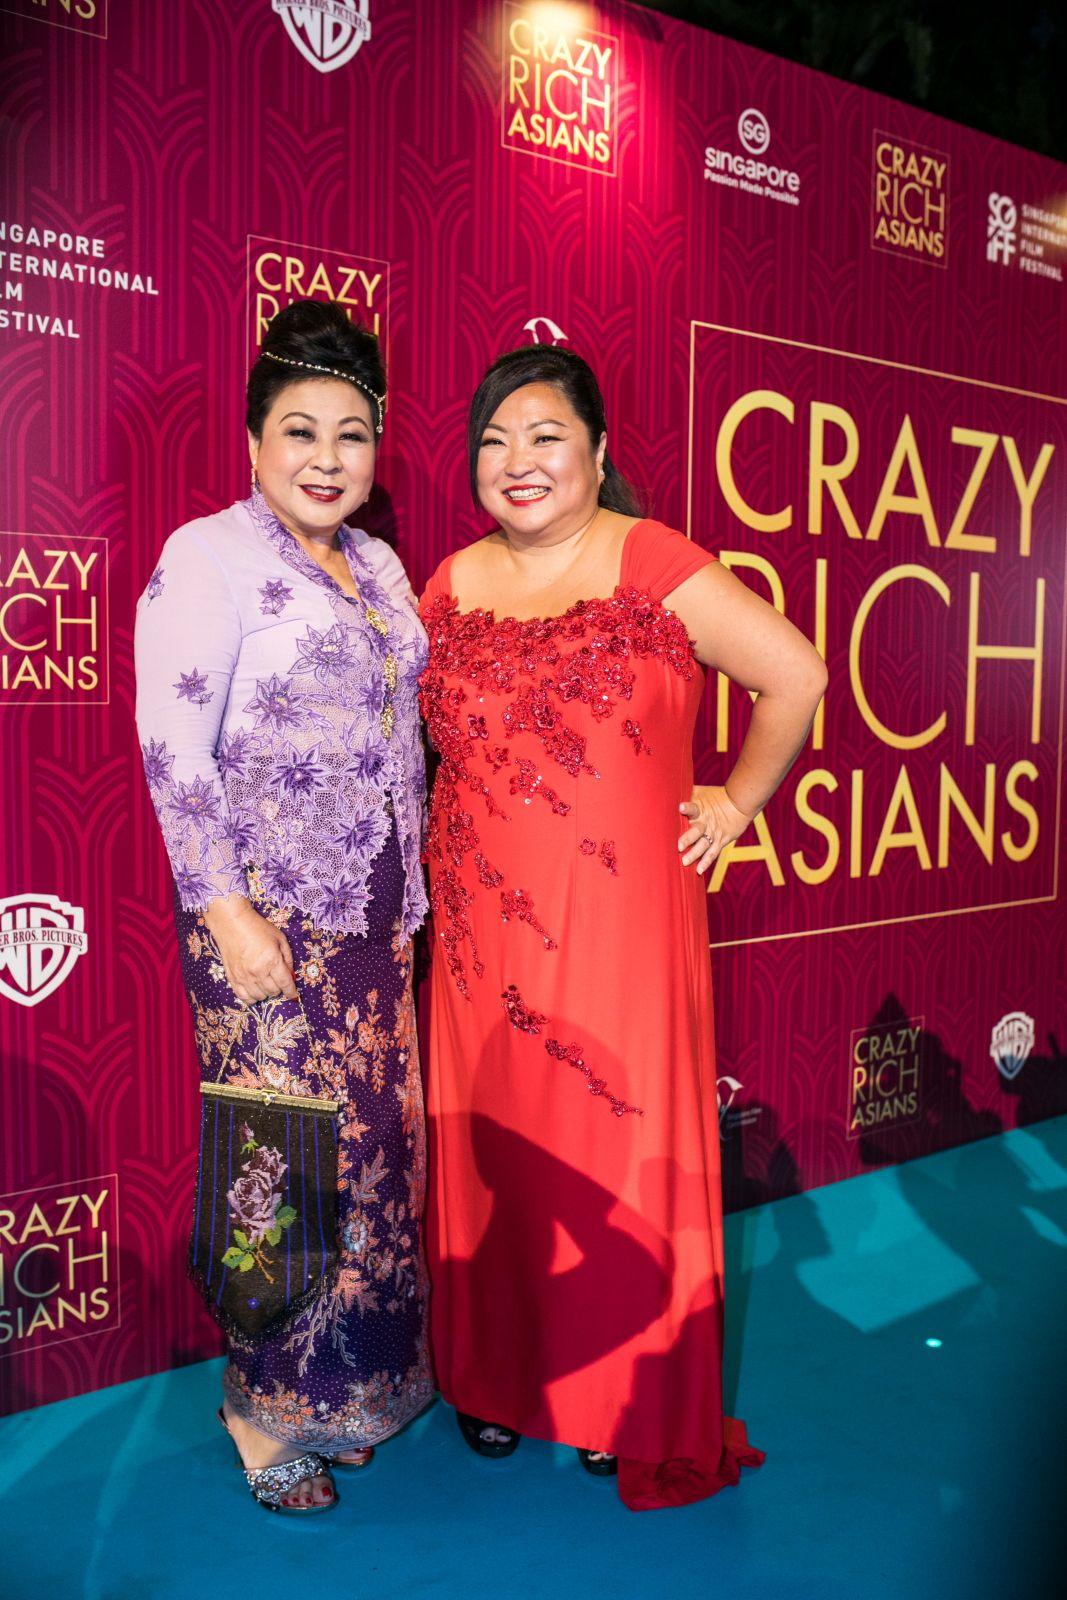 Koh Chieng Mun, Selena Tan